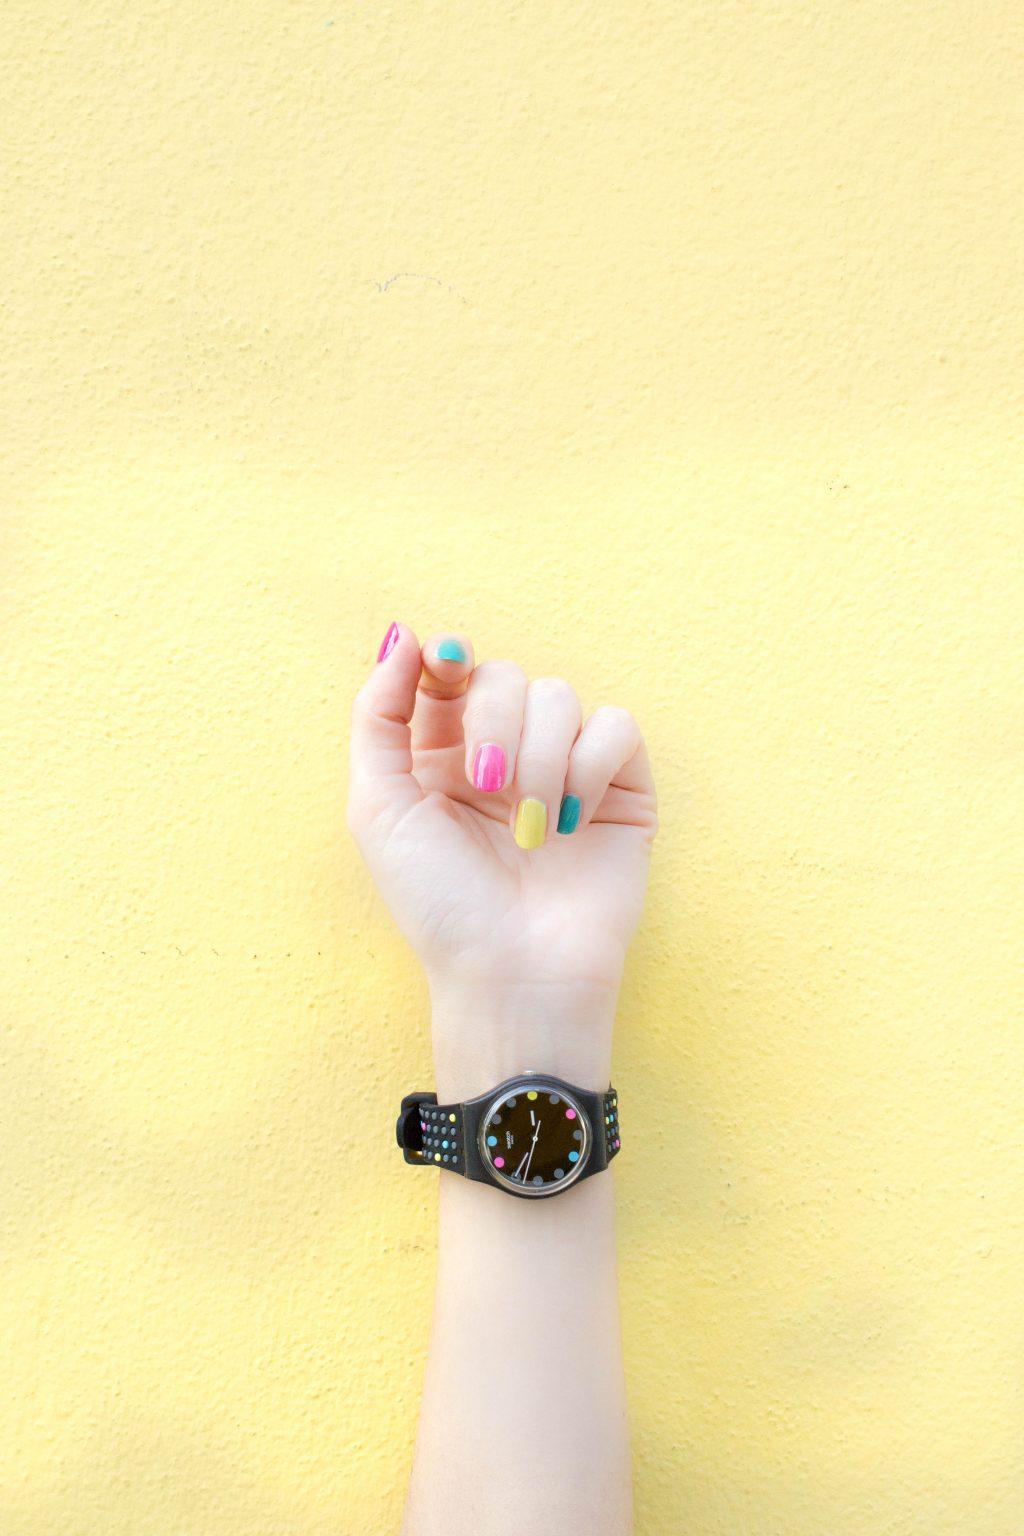 View this post on Instagram #jeweltone #chrome #nails #nailsofinstagram #almondshapednails #cndbrisagel #gelrebalance #manicure #cndshellac #mirrornails #nailart A post shared by Christina (@lashhhsecret) on Sep 17, 2019 at 8:15pm PDT